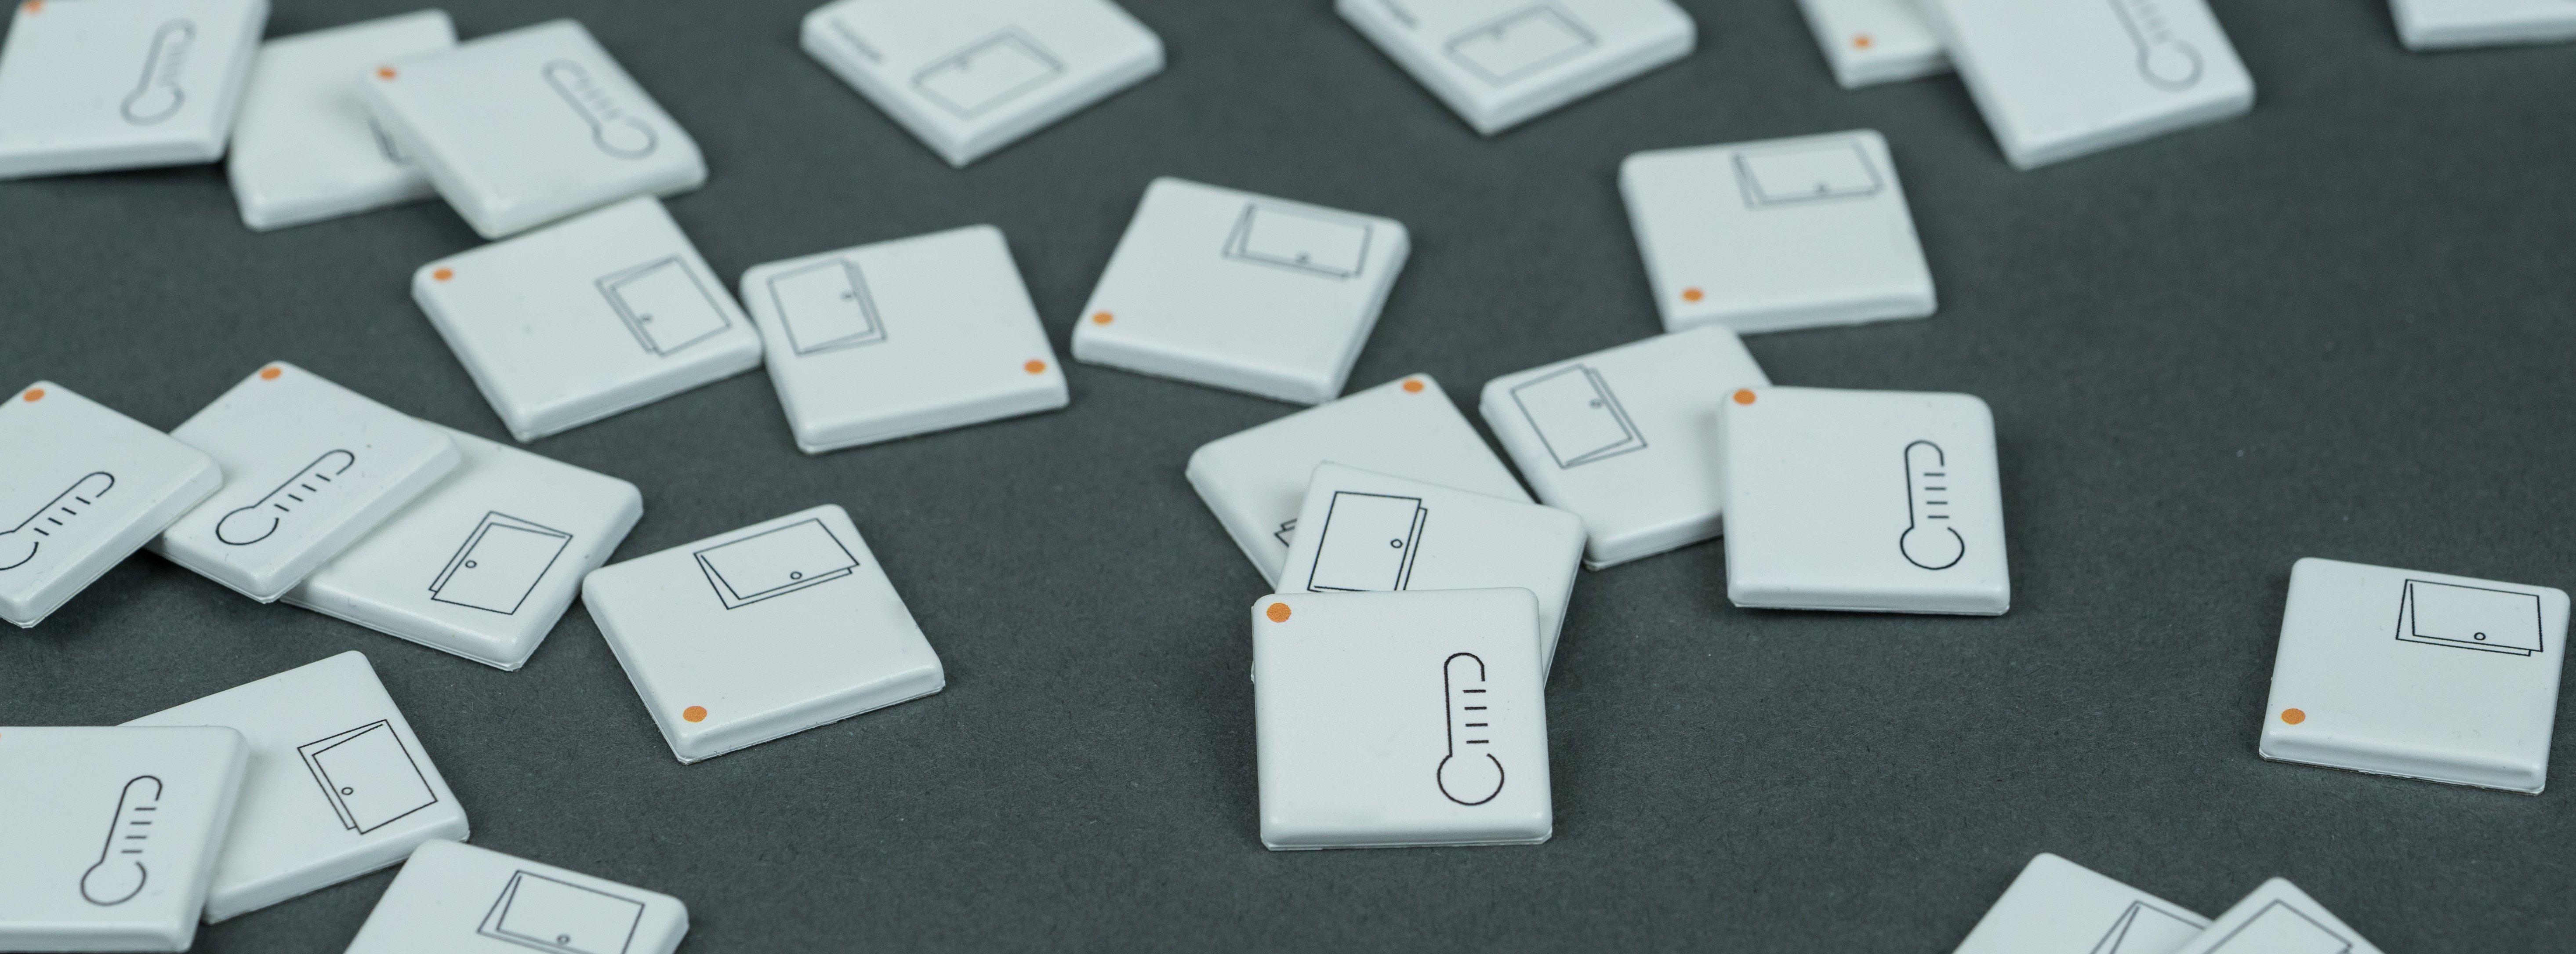 disruptive technologies various iot sensors